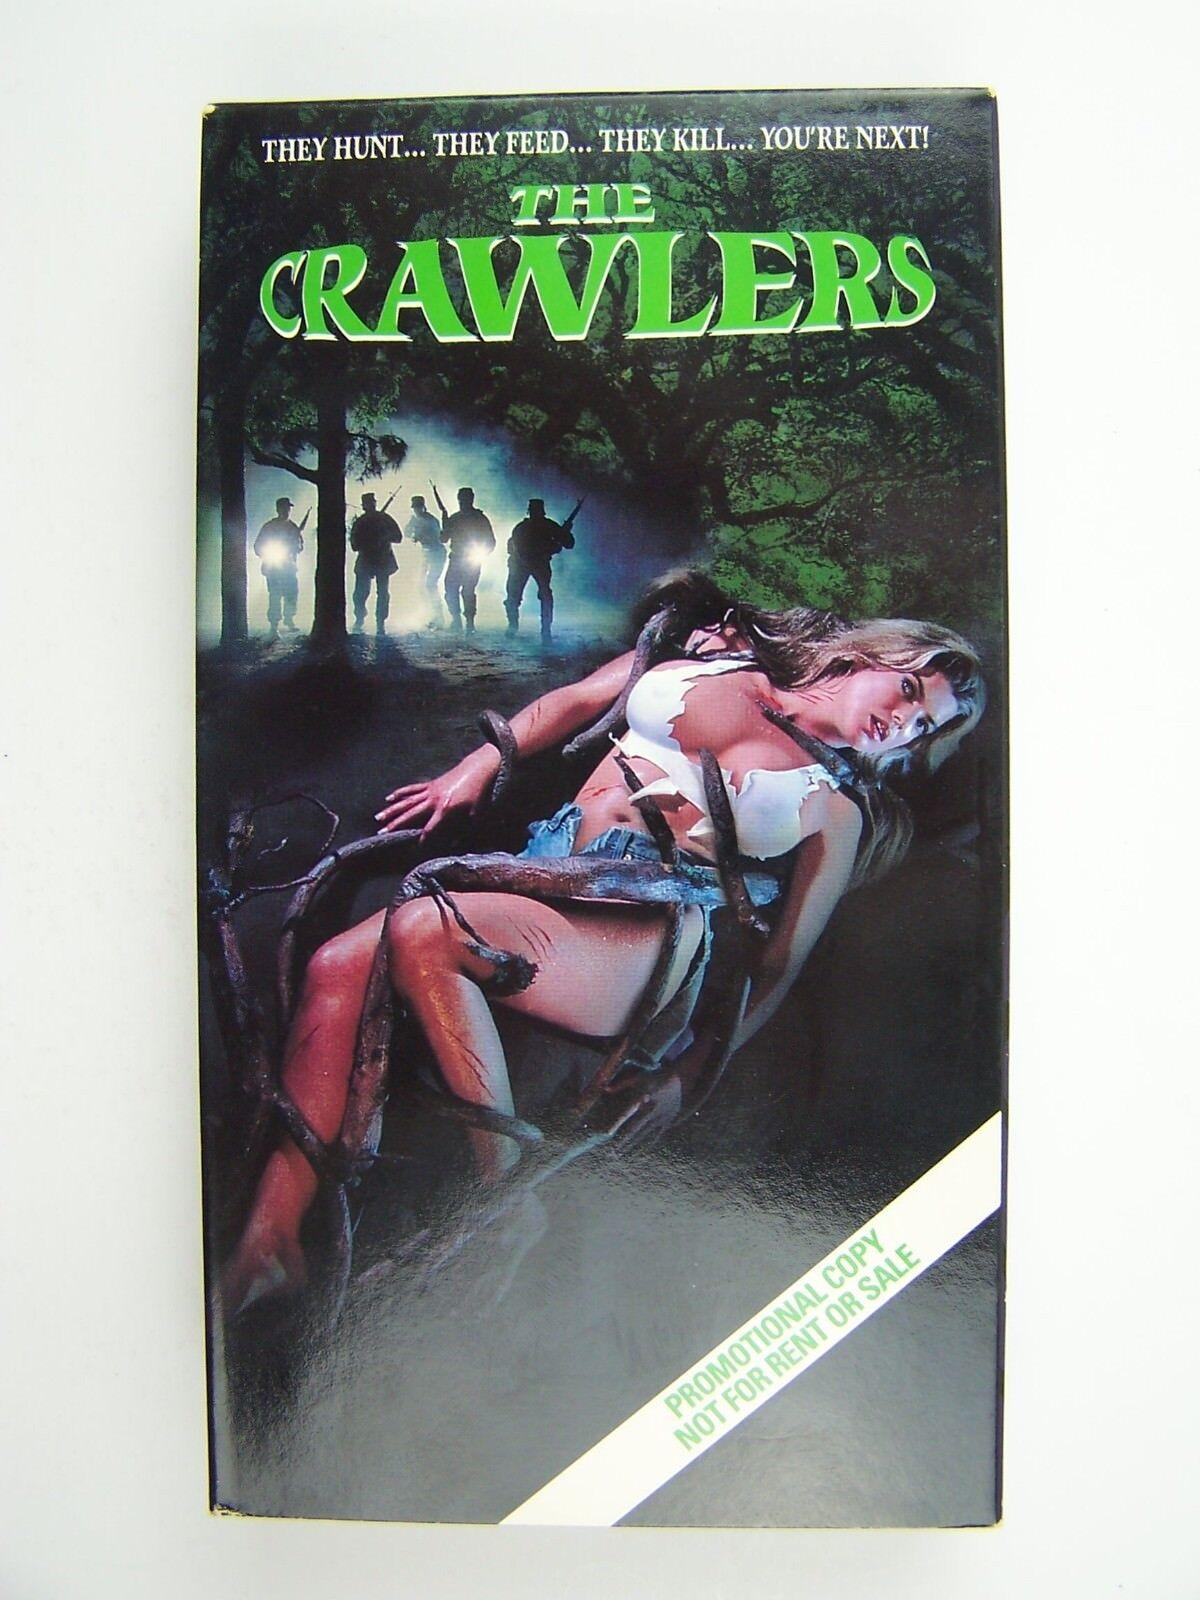 The Crawlers VHS Video Promo Screener ~RARE